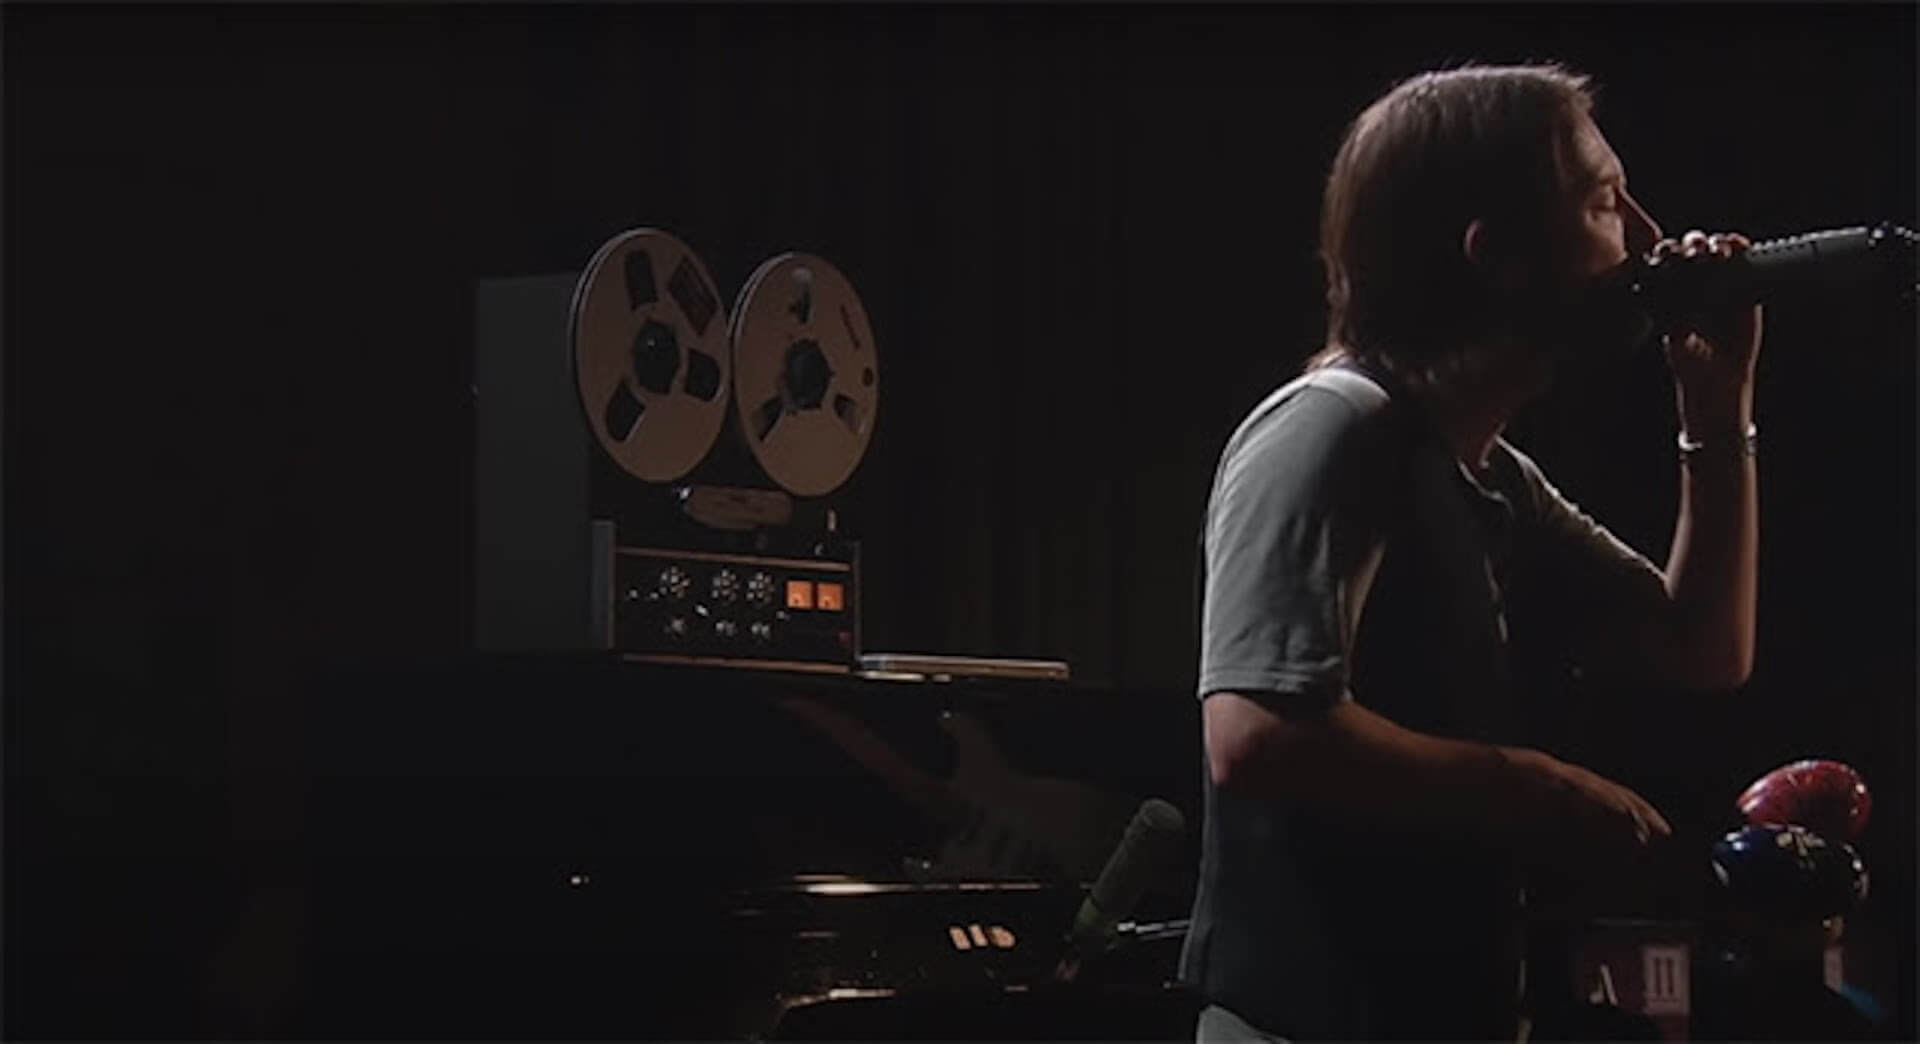 Radioheadの名盤『King of Limbs』のスタジオライブ映像が公開|ナイジェル・ゴドリッチがミックスを担当 music200522_radiohead_5